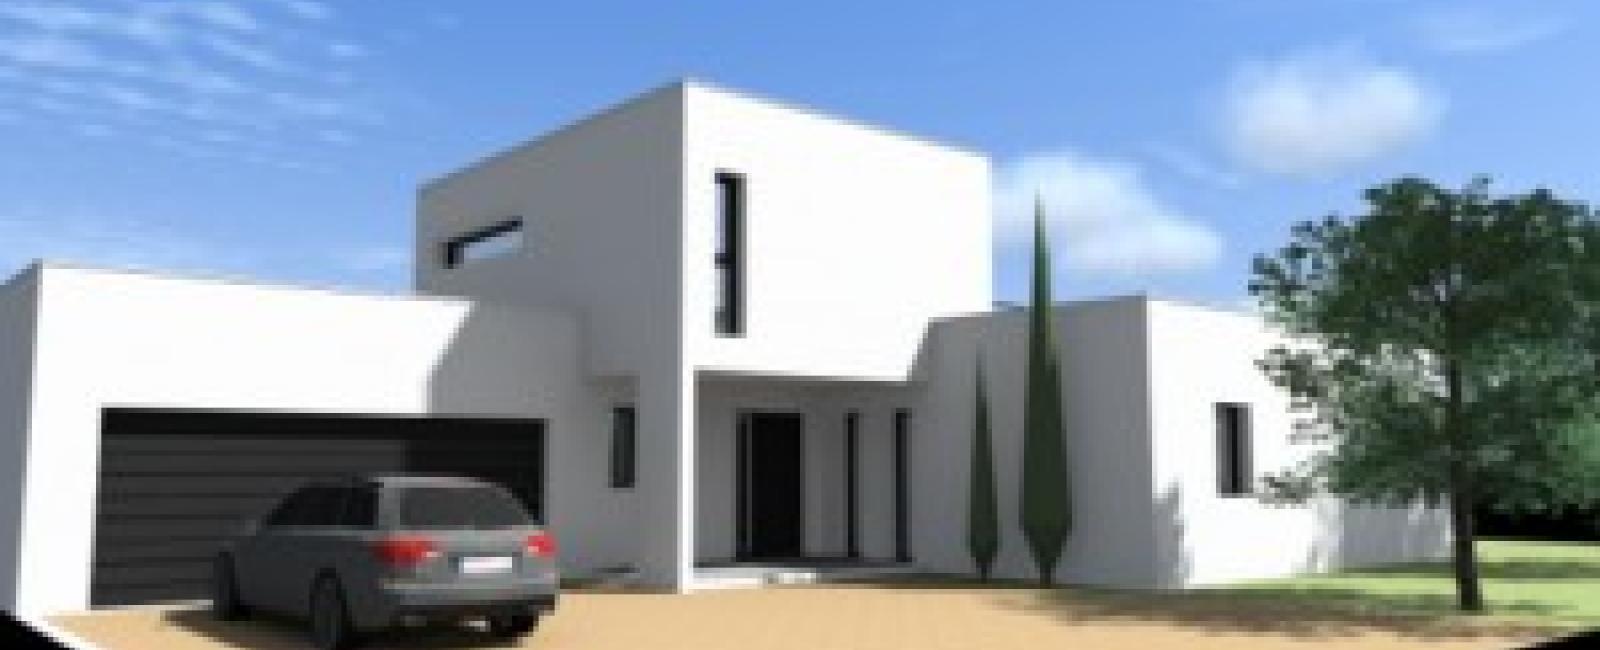 architecte montpellier maison individuelle ventana blog. Black Bedroom Furniture Sets. Home Design Ideas